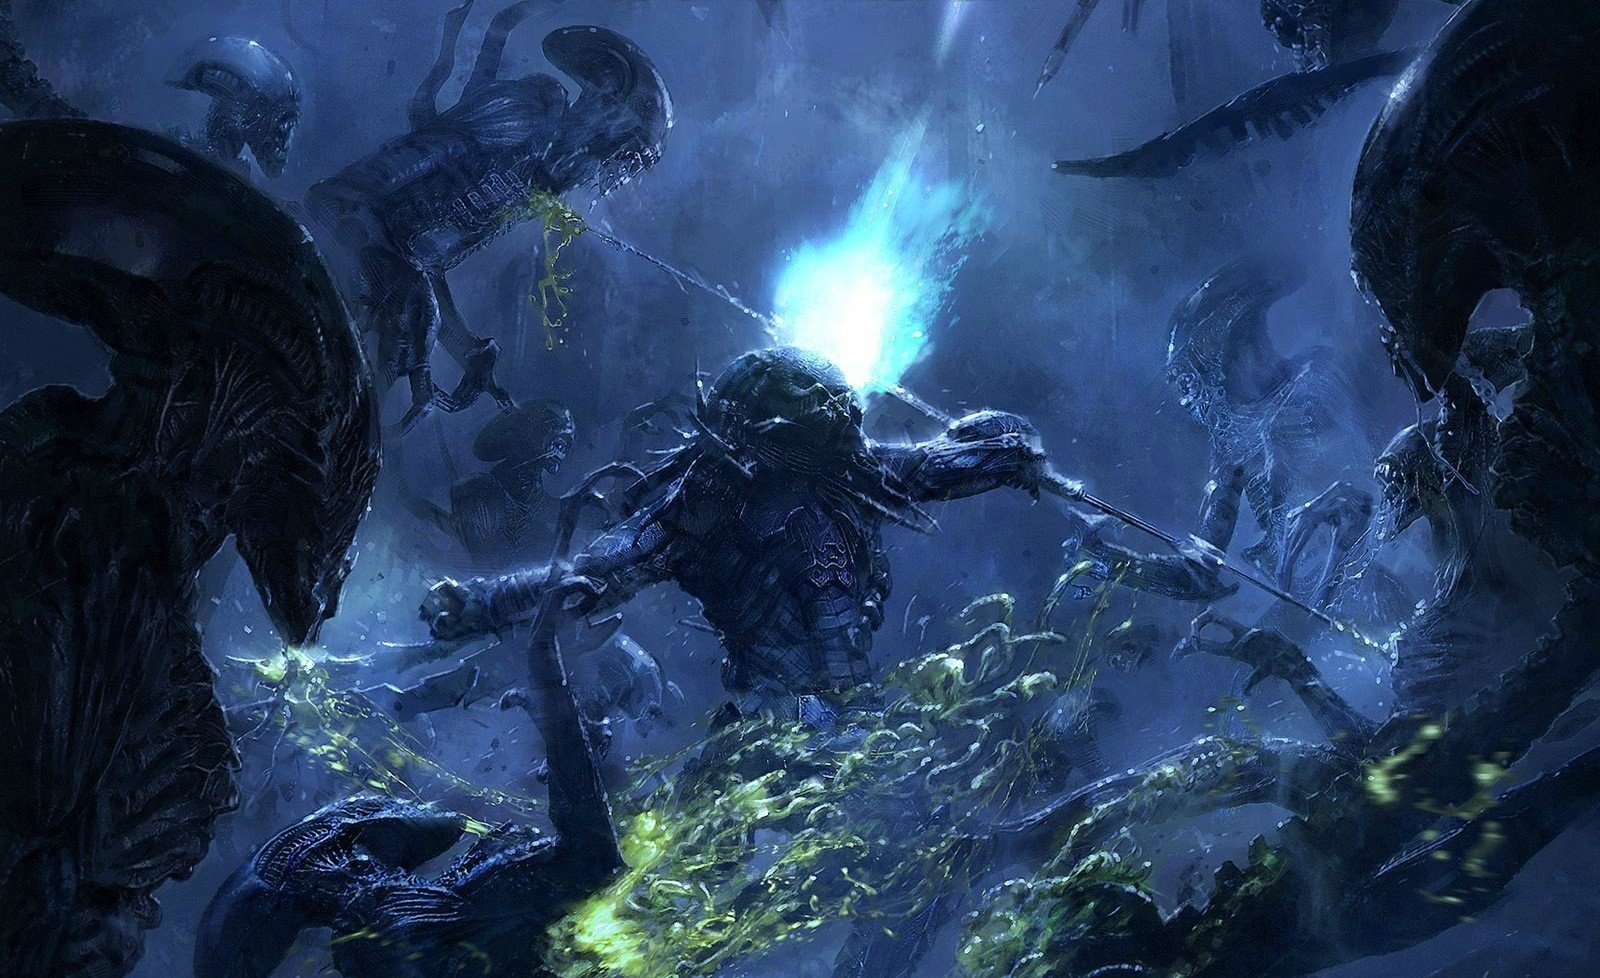 Alien Vs Predator Hd Wallpapers: Alien Vs. Predator Wallpaper And Background Image